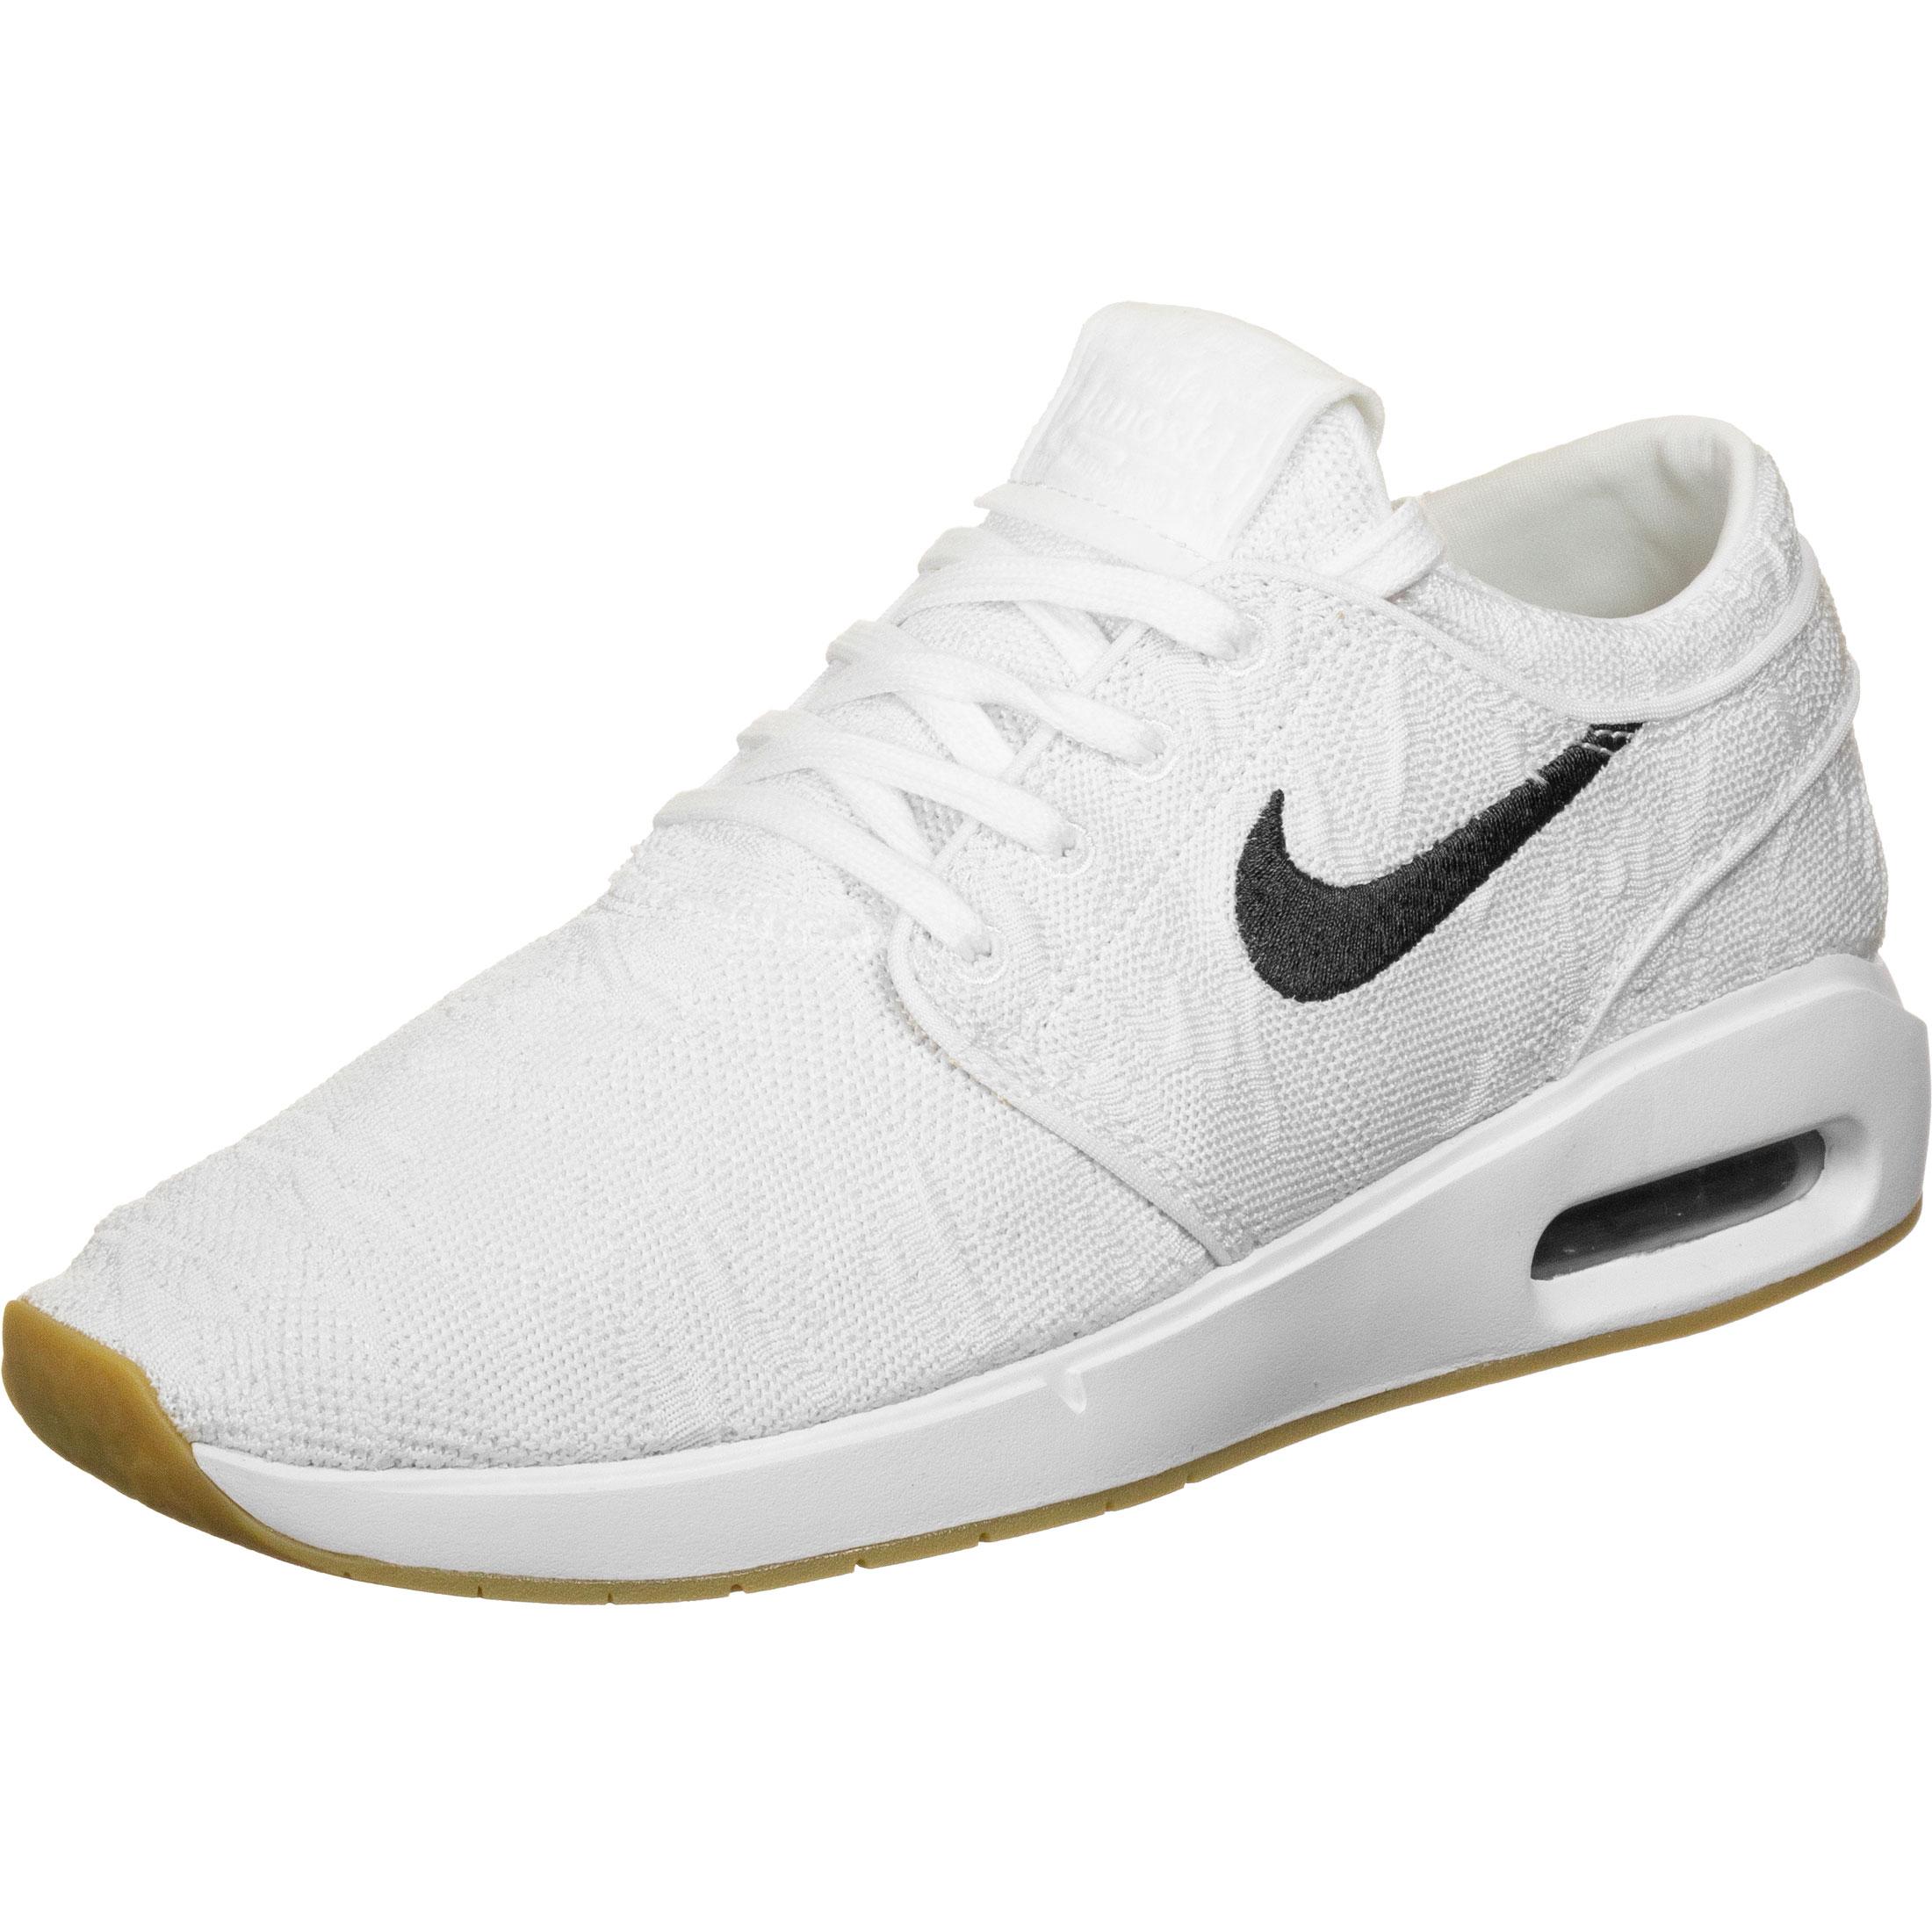 Nike SB Air Max Janoski 2 - Sneakers